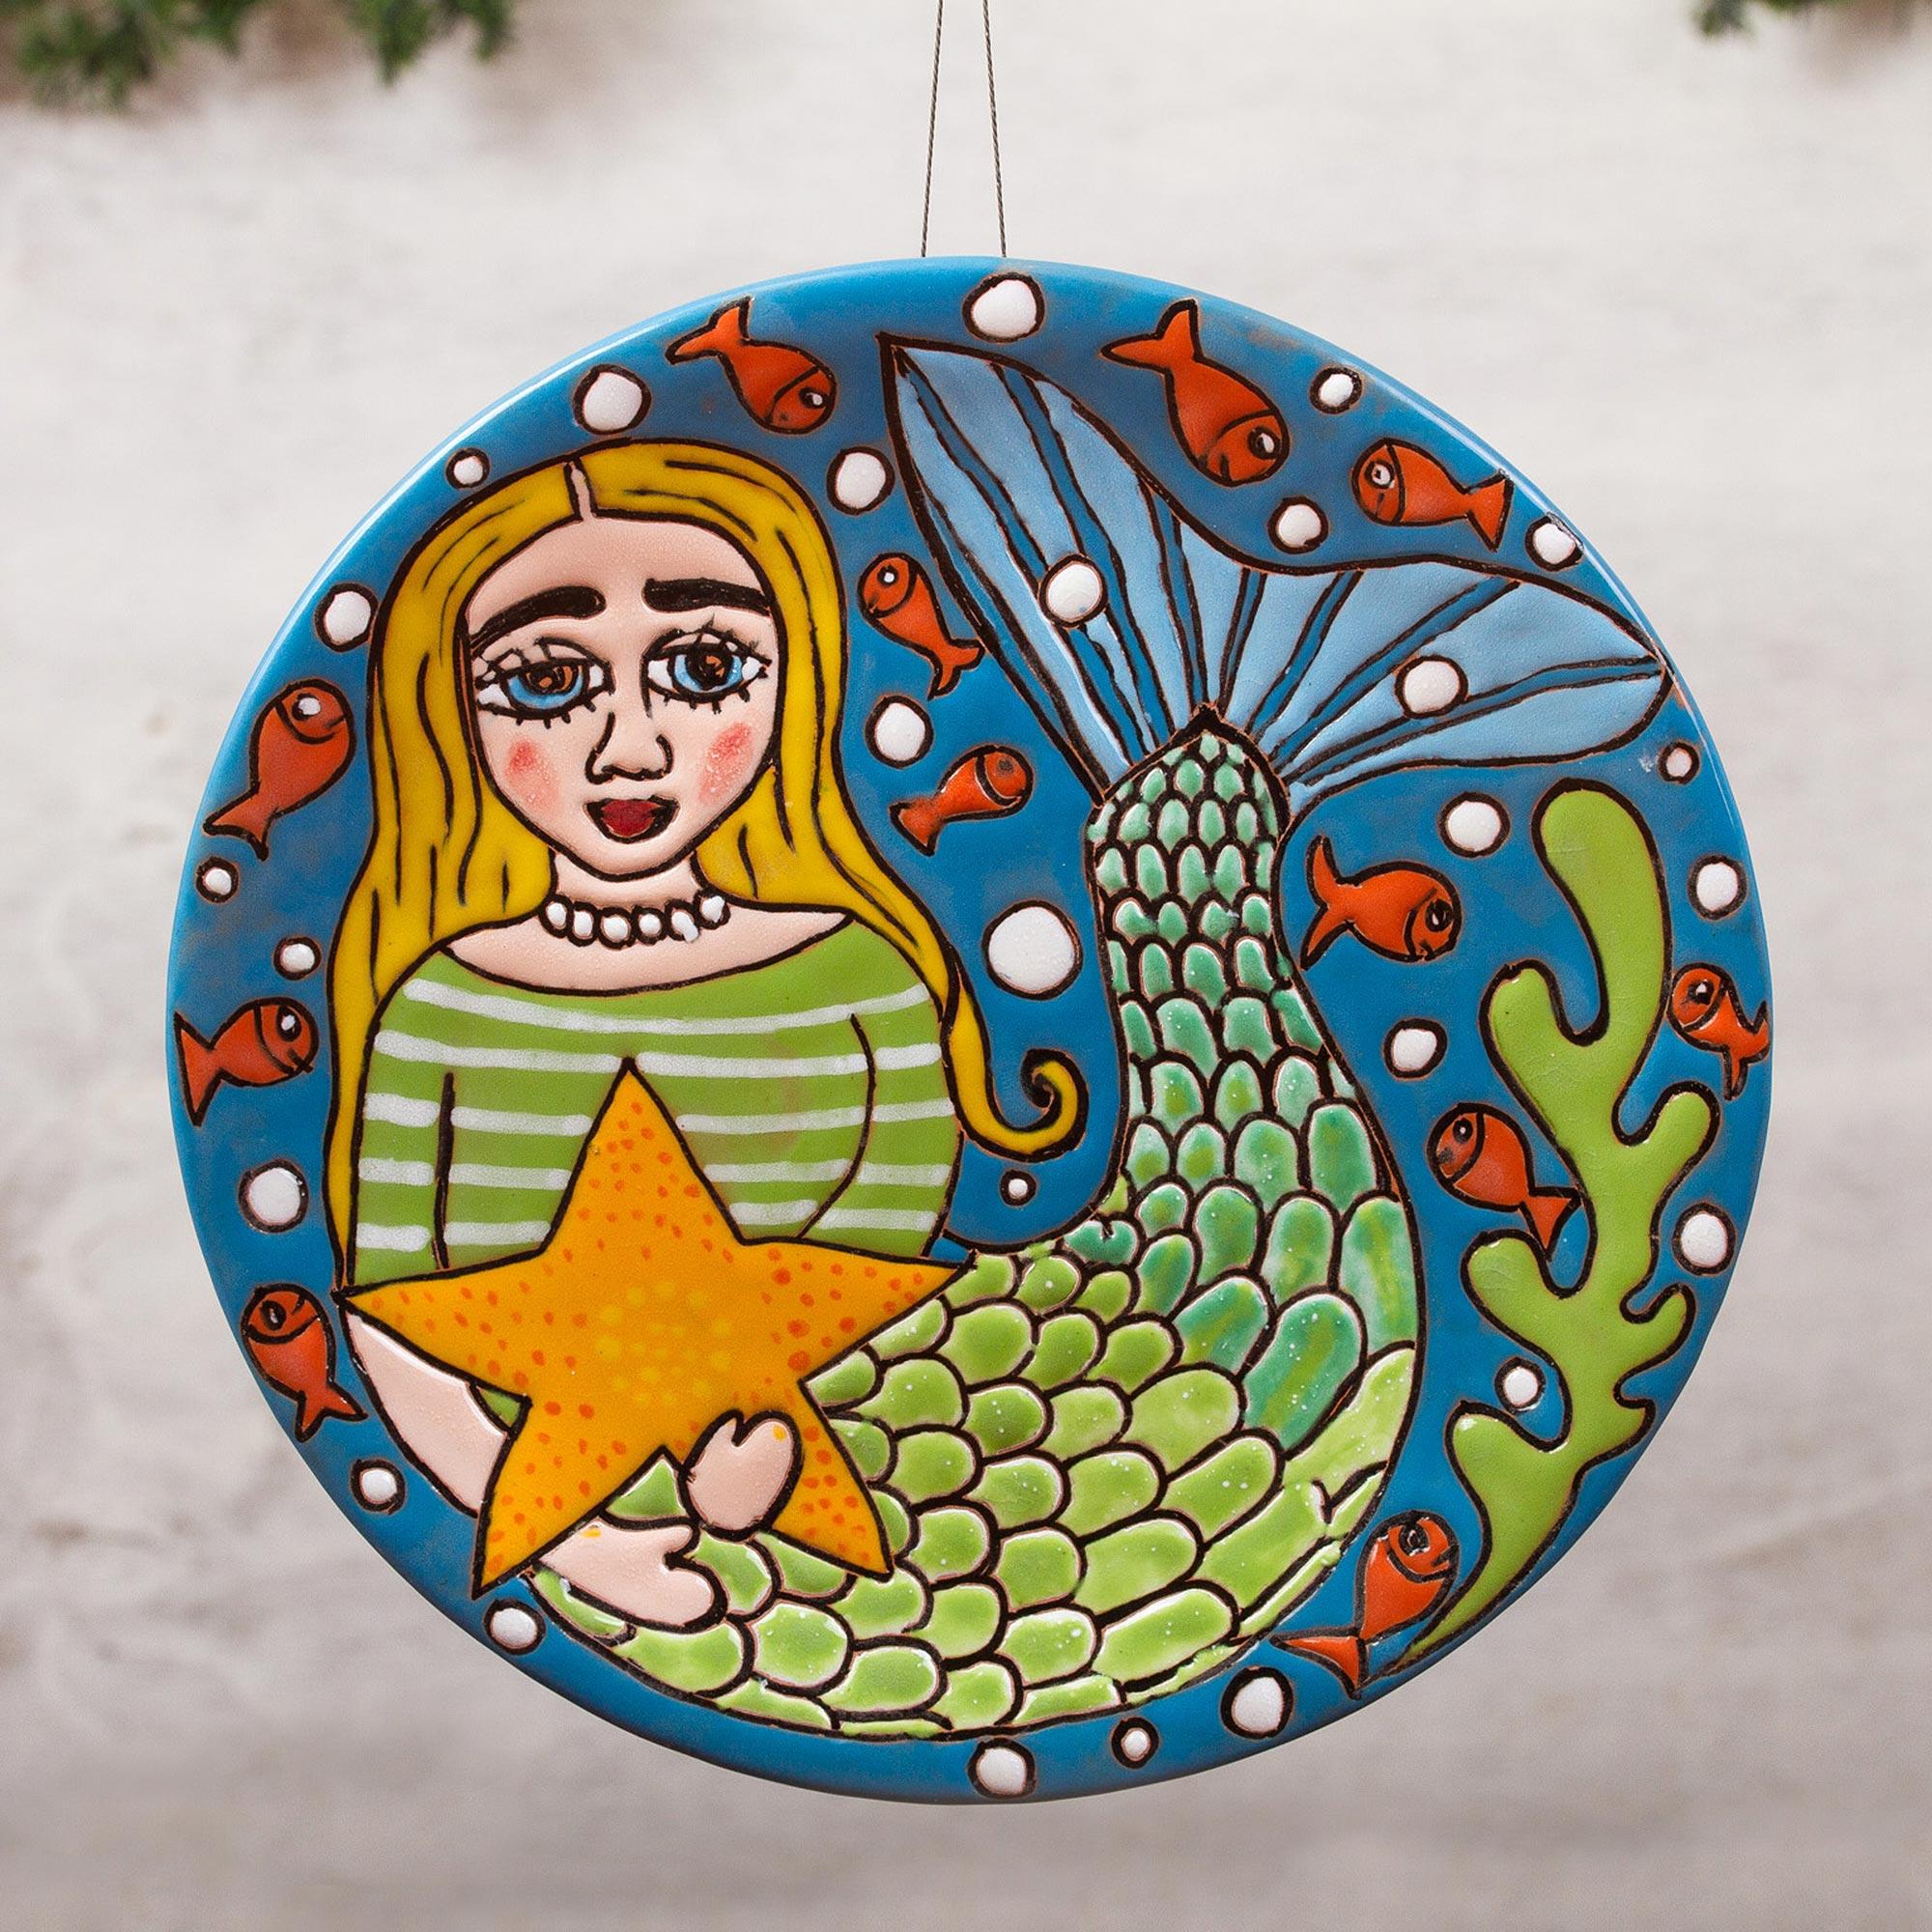 Handmade Ceramic Mermaid Wall Art From Mexico Mermaid And Starfish Novica